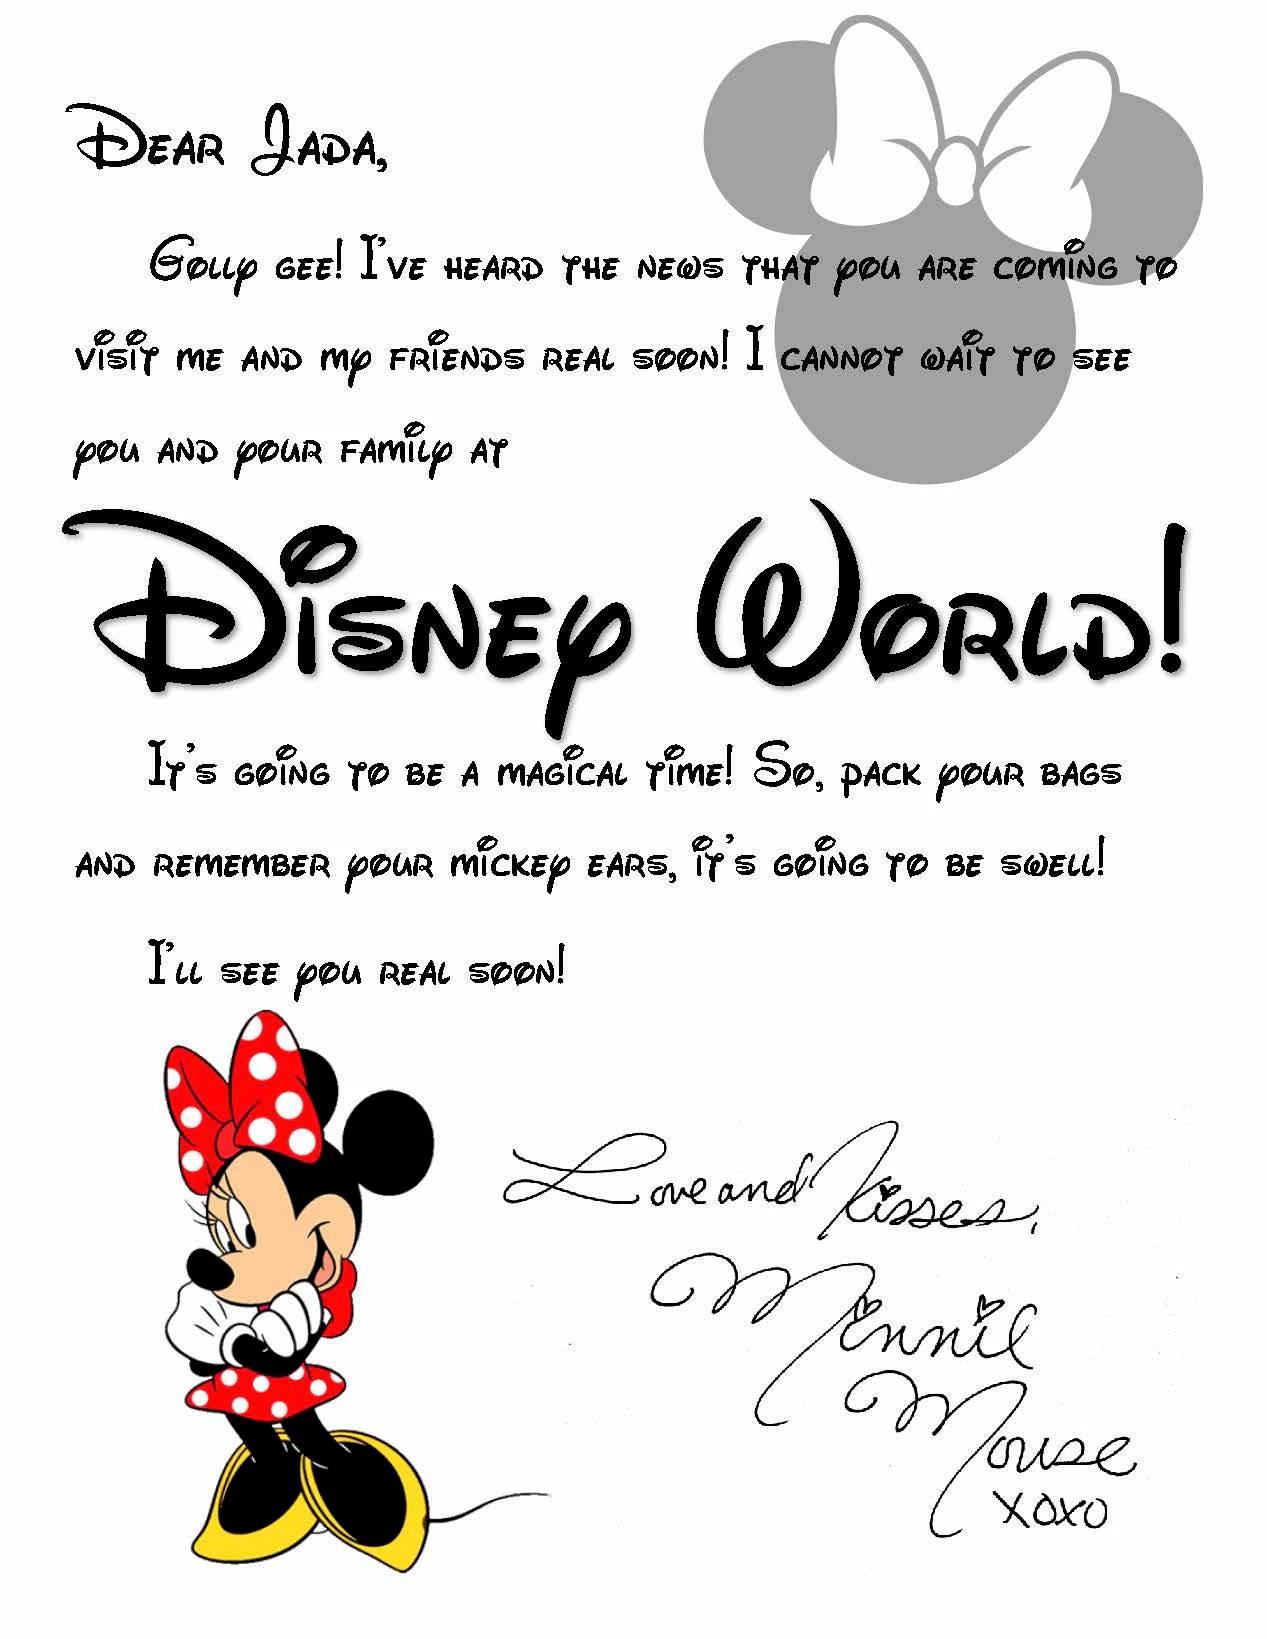 Custom Disney World Letter From Minnie Invitation To